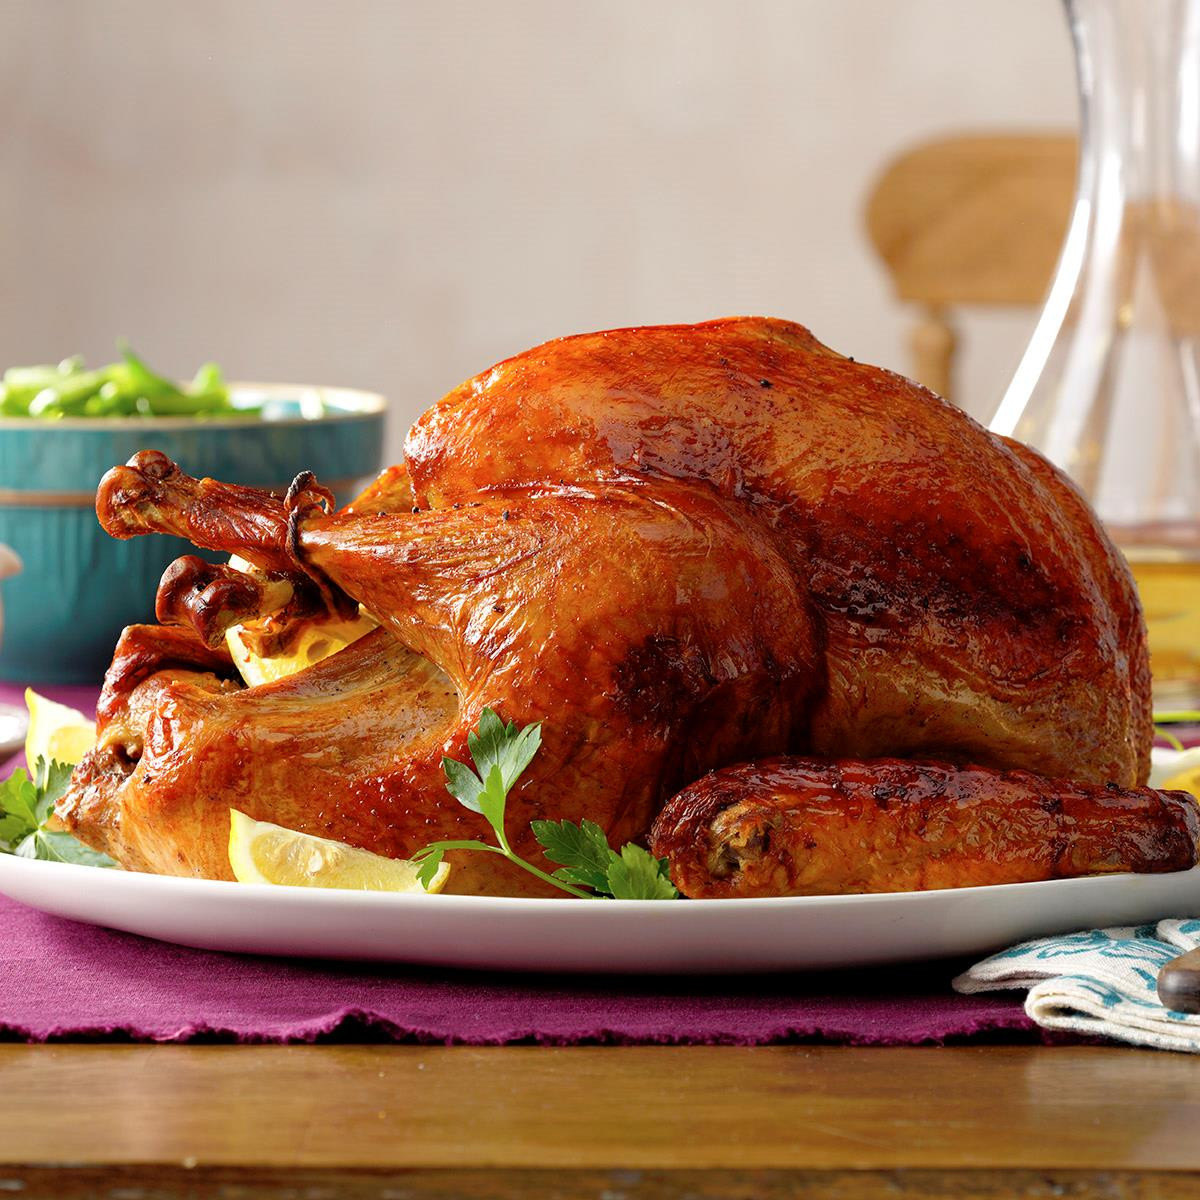 Pics Of Thanksgiving Turkey  Marinated Thanksgiving Turkey Recipe